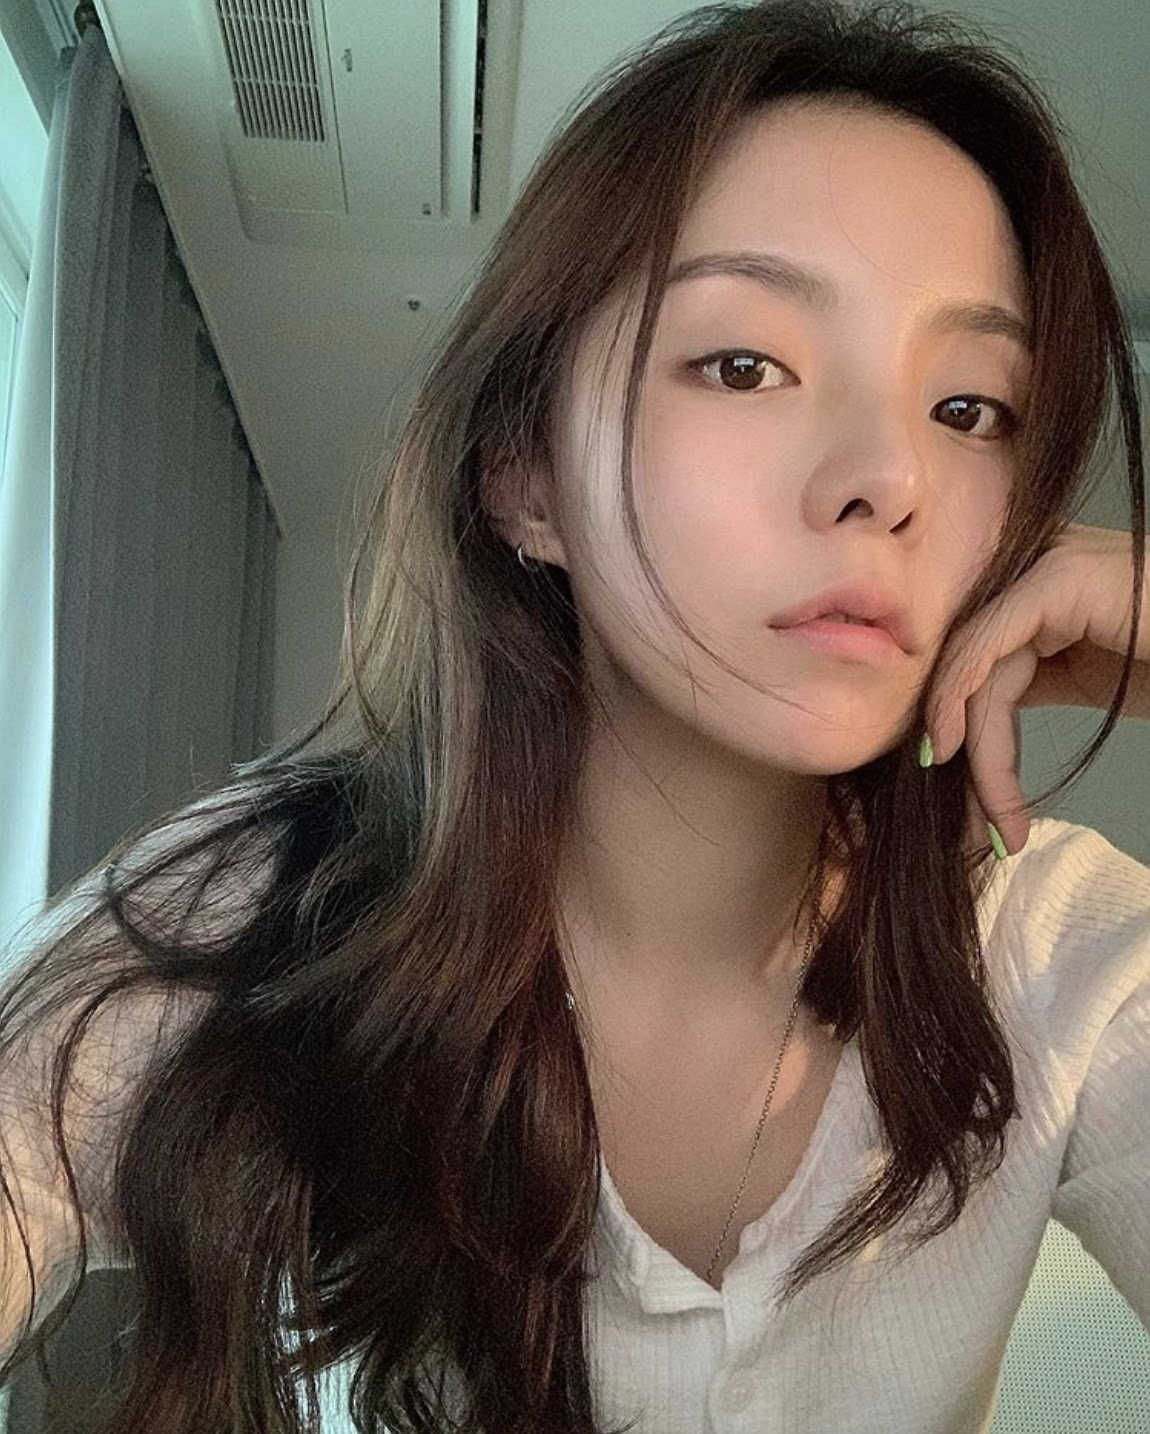 jung dawon